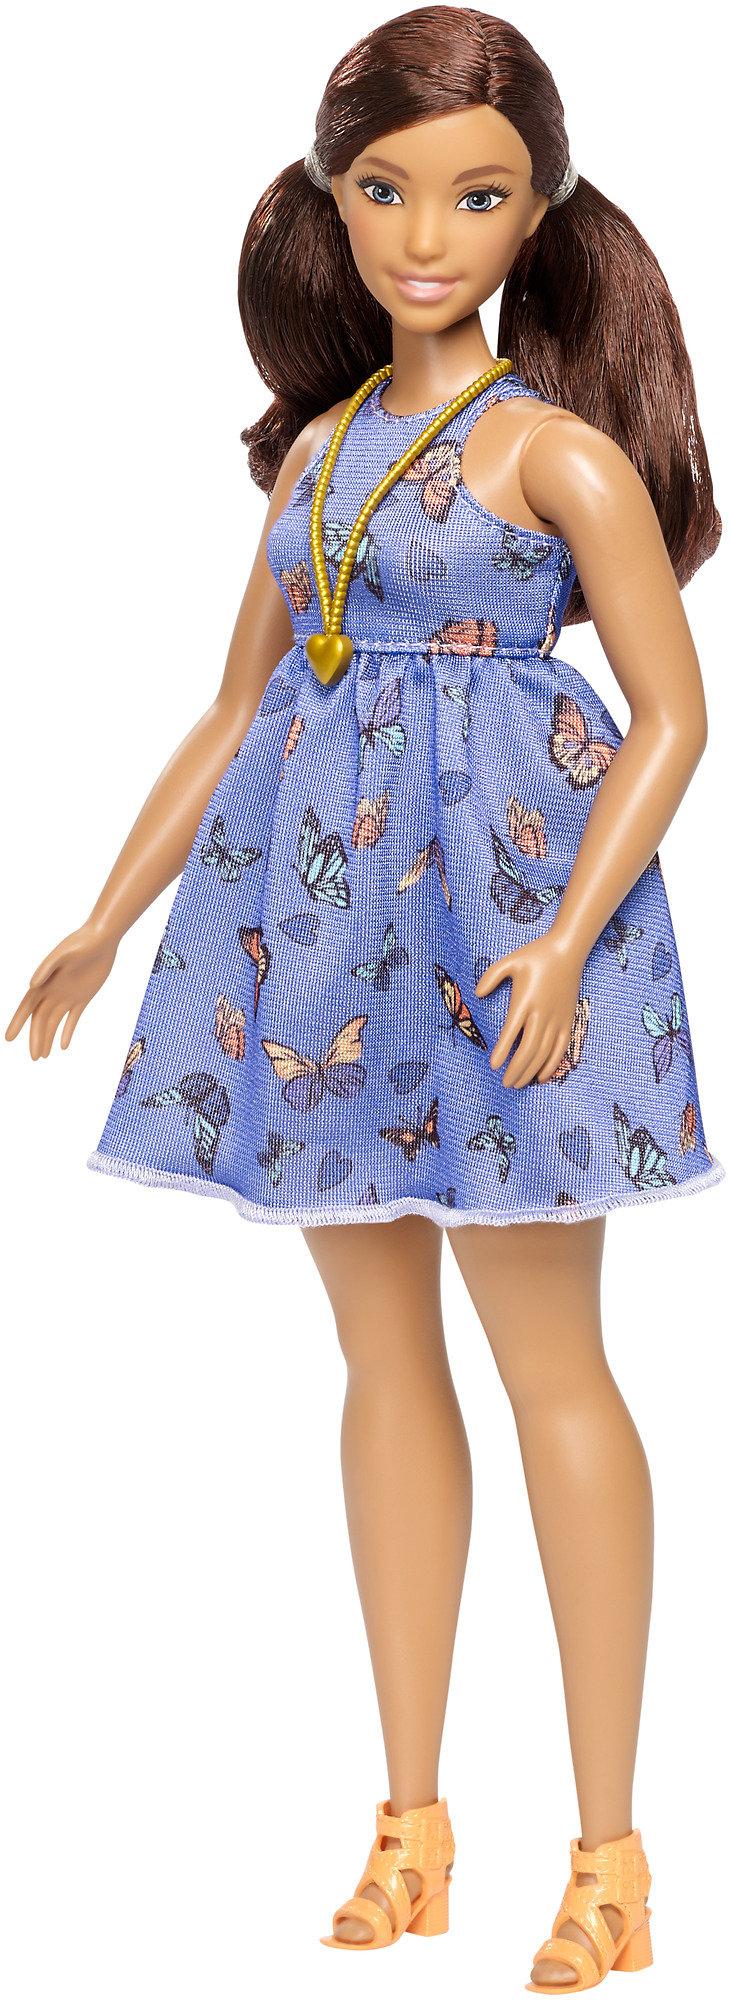 Barbie Fashionistas Curvy Doll 66 Beautiful Butterflies by Mattel